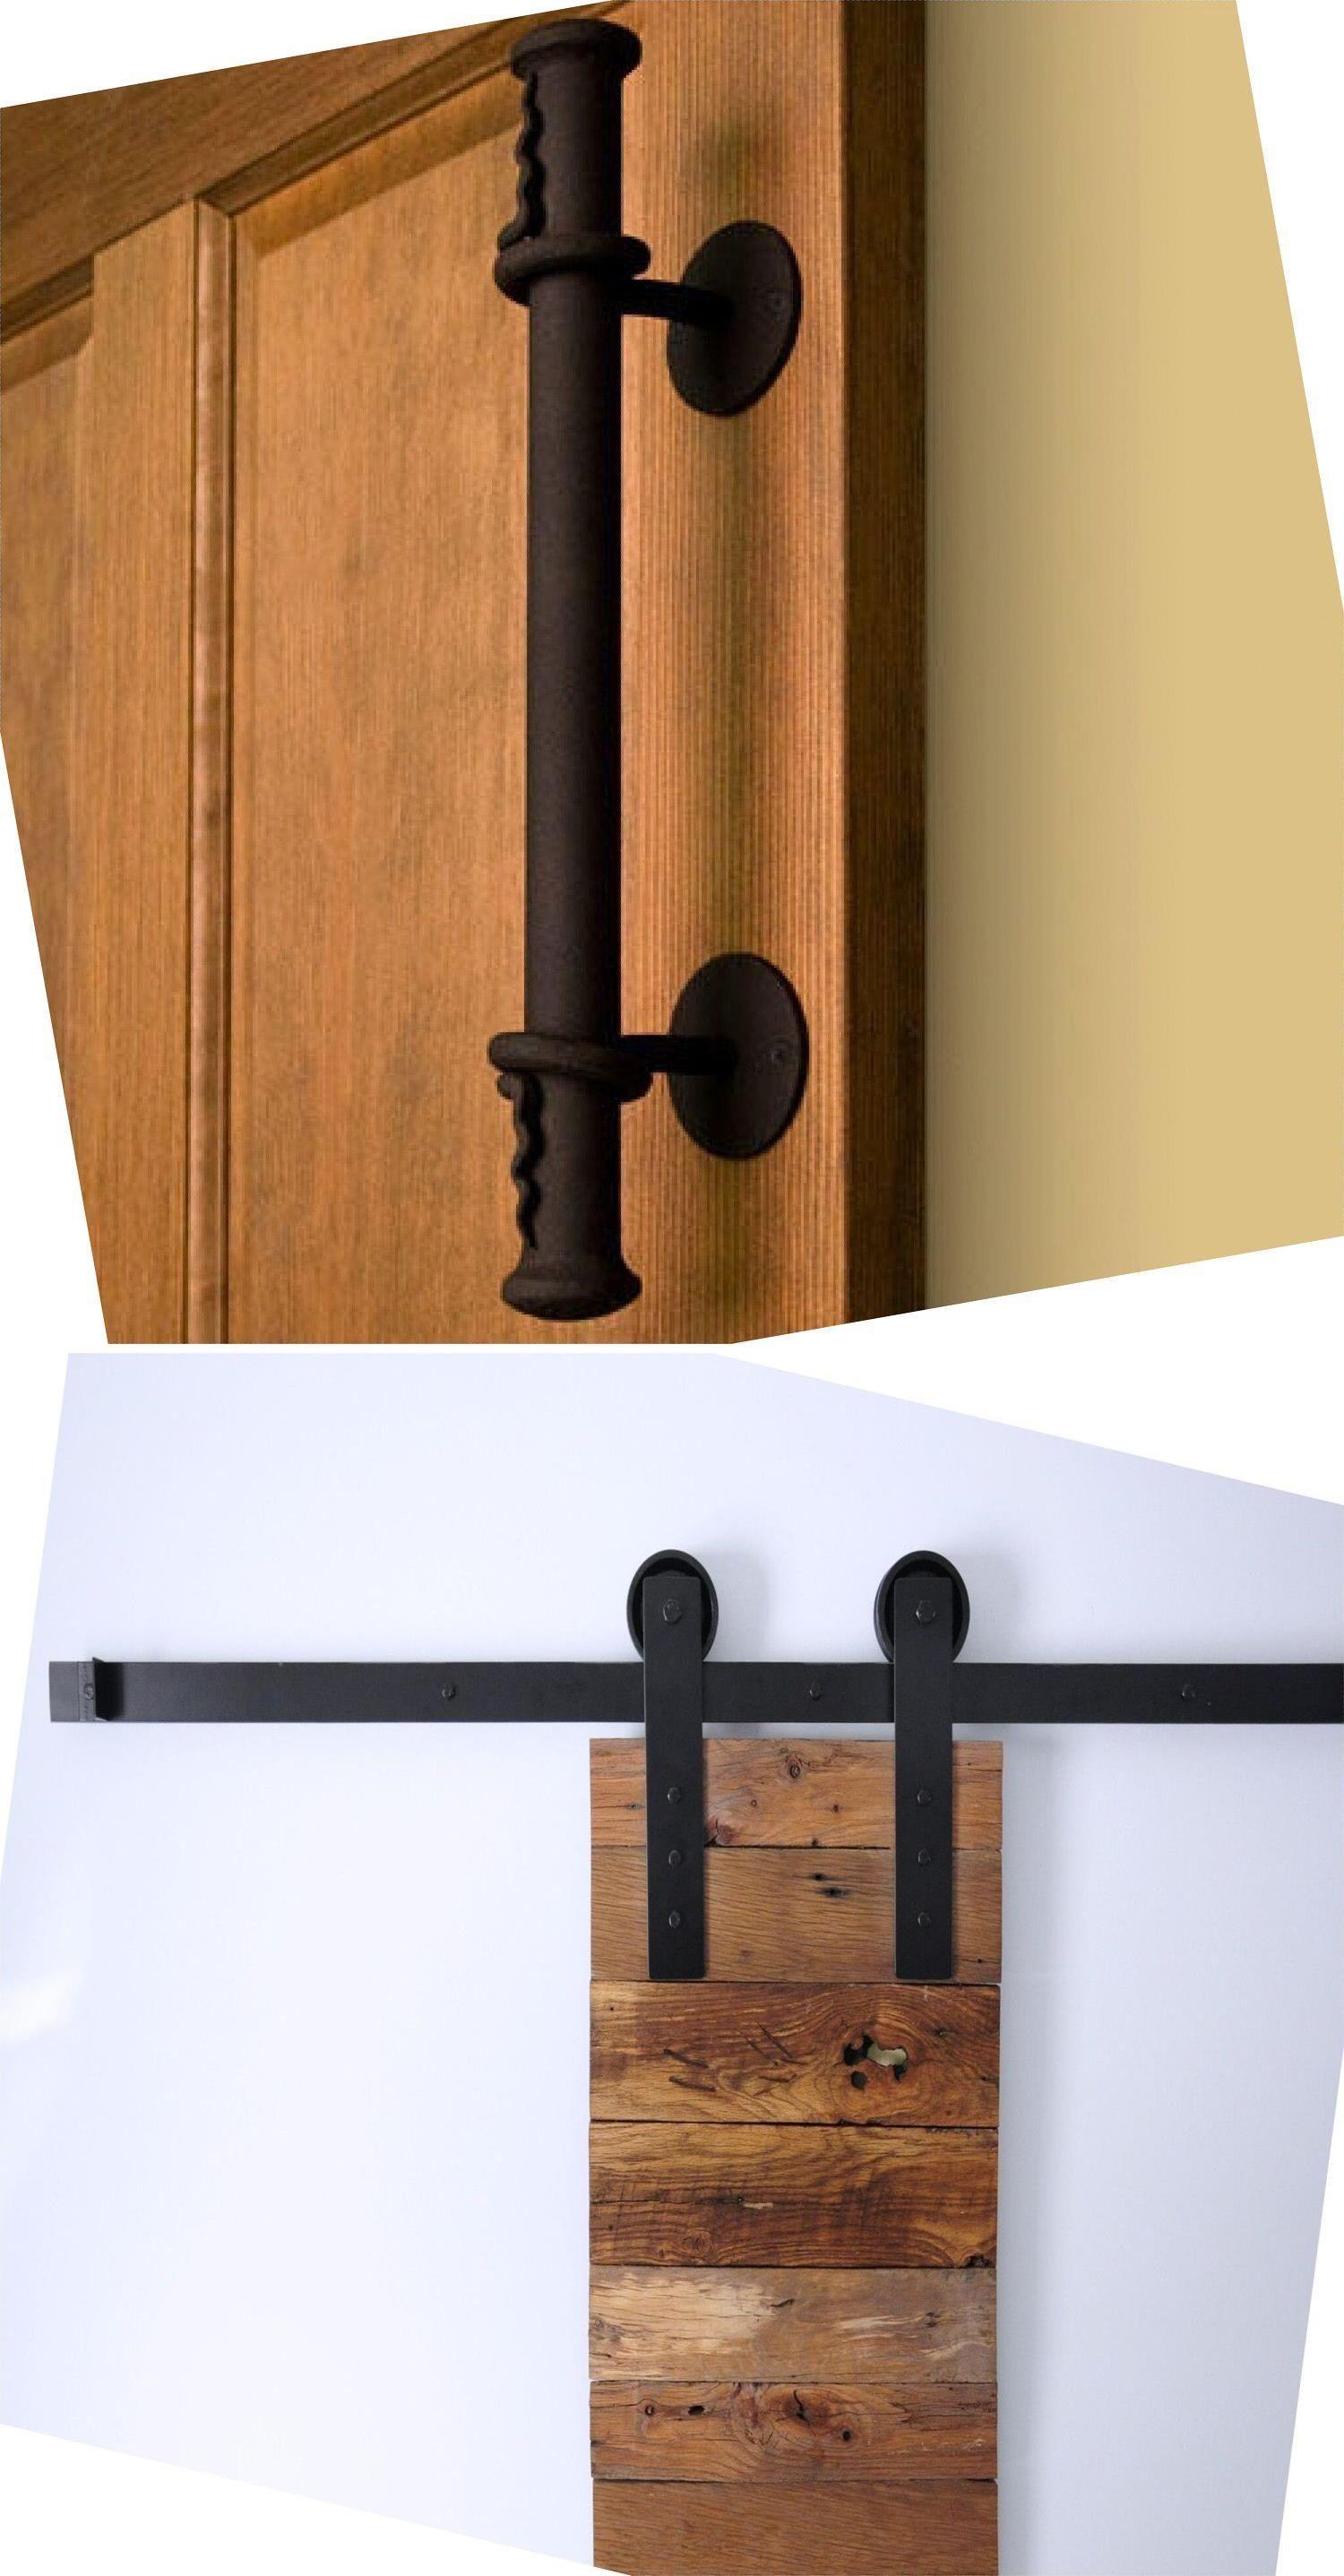 Barn Door Handles And Locks Interior Barn Door Lock Barn Door